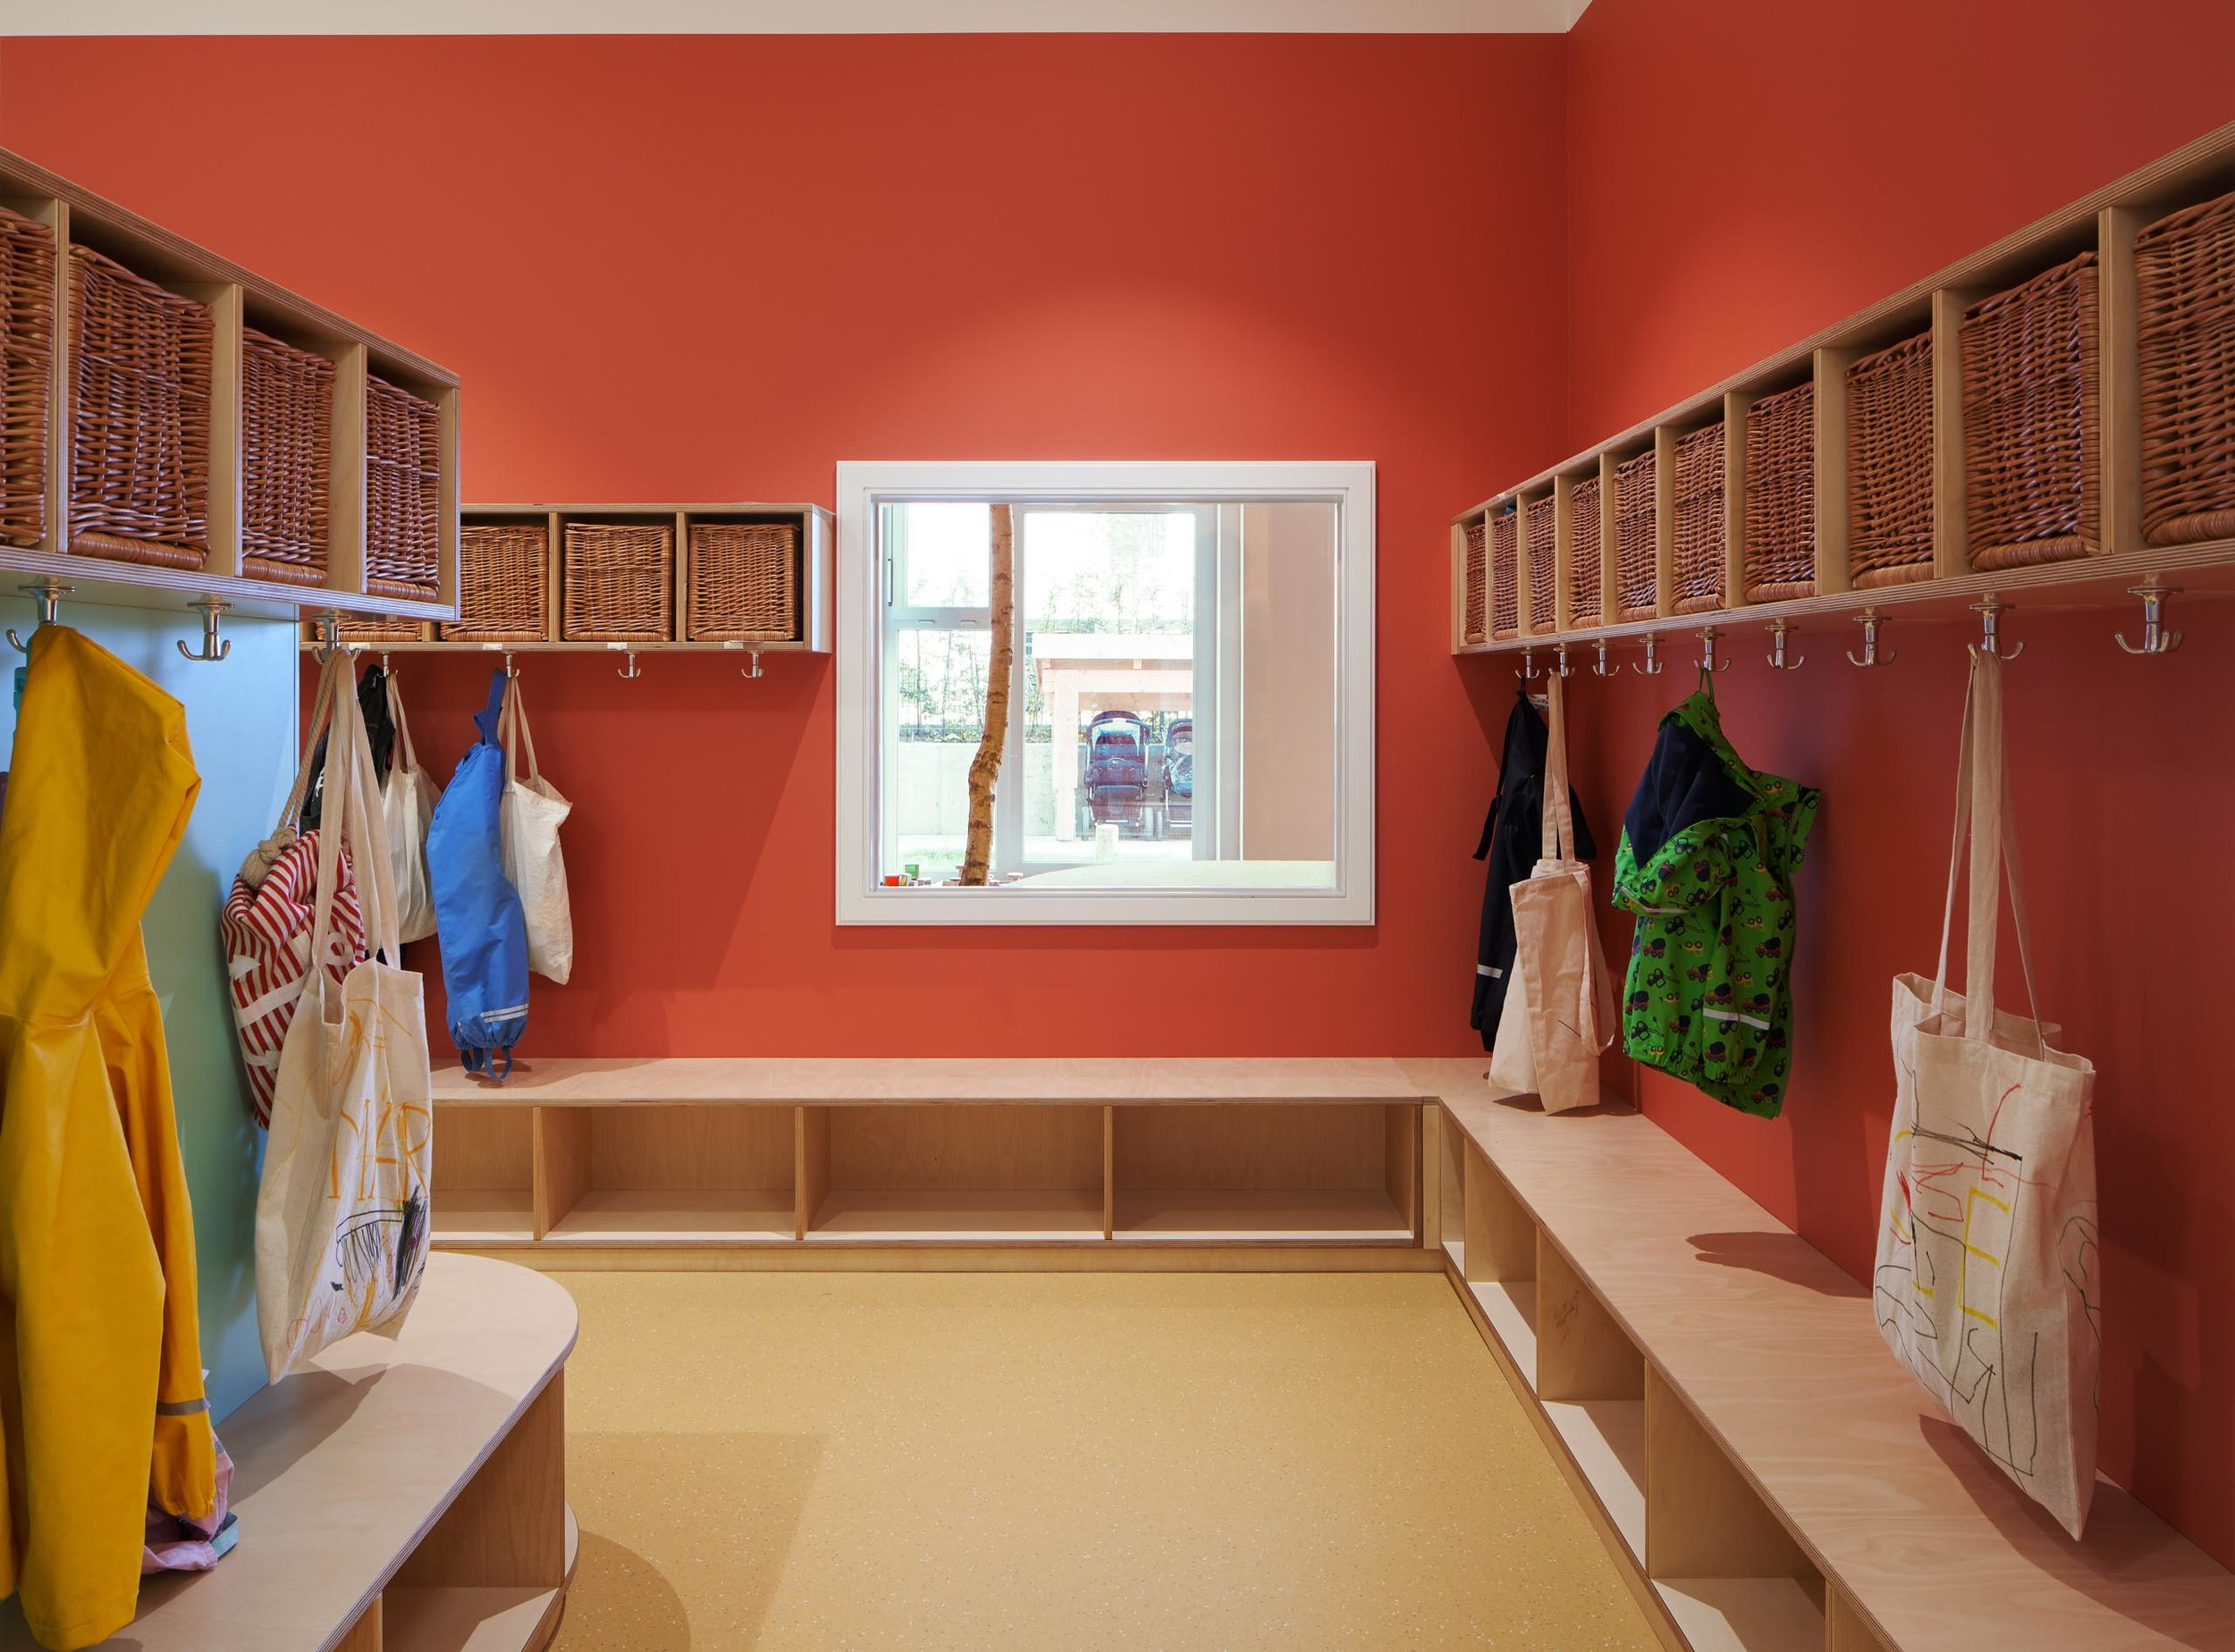 Garderobe der Kita Sand Vika in Hamburg